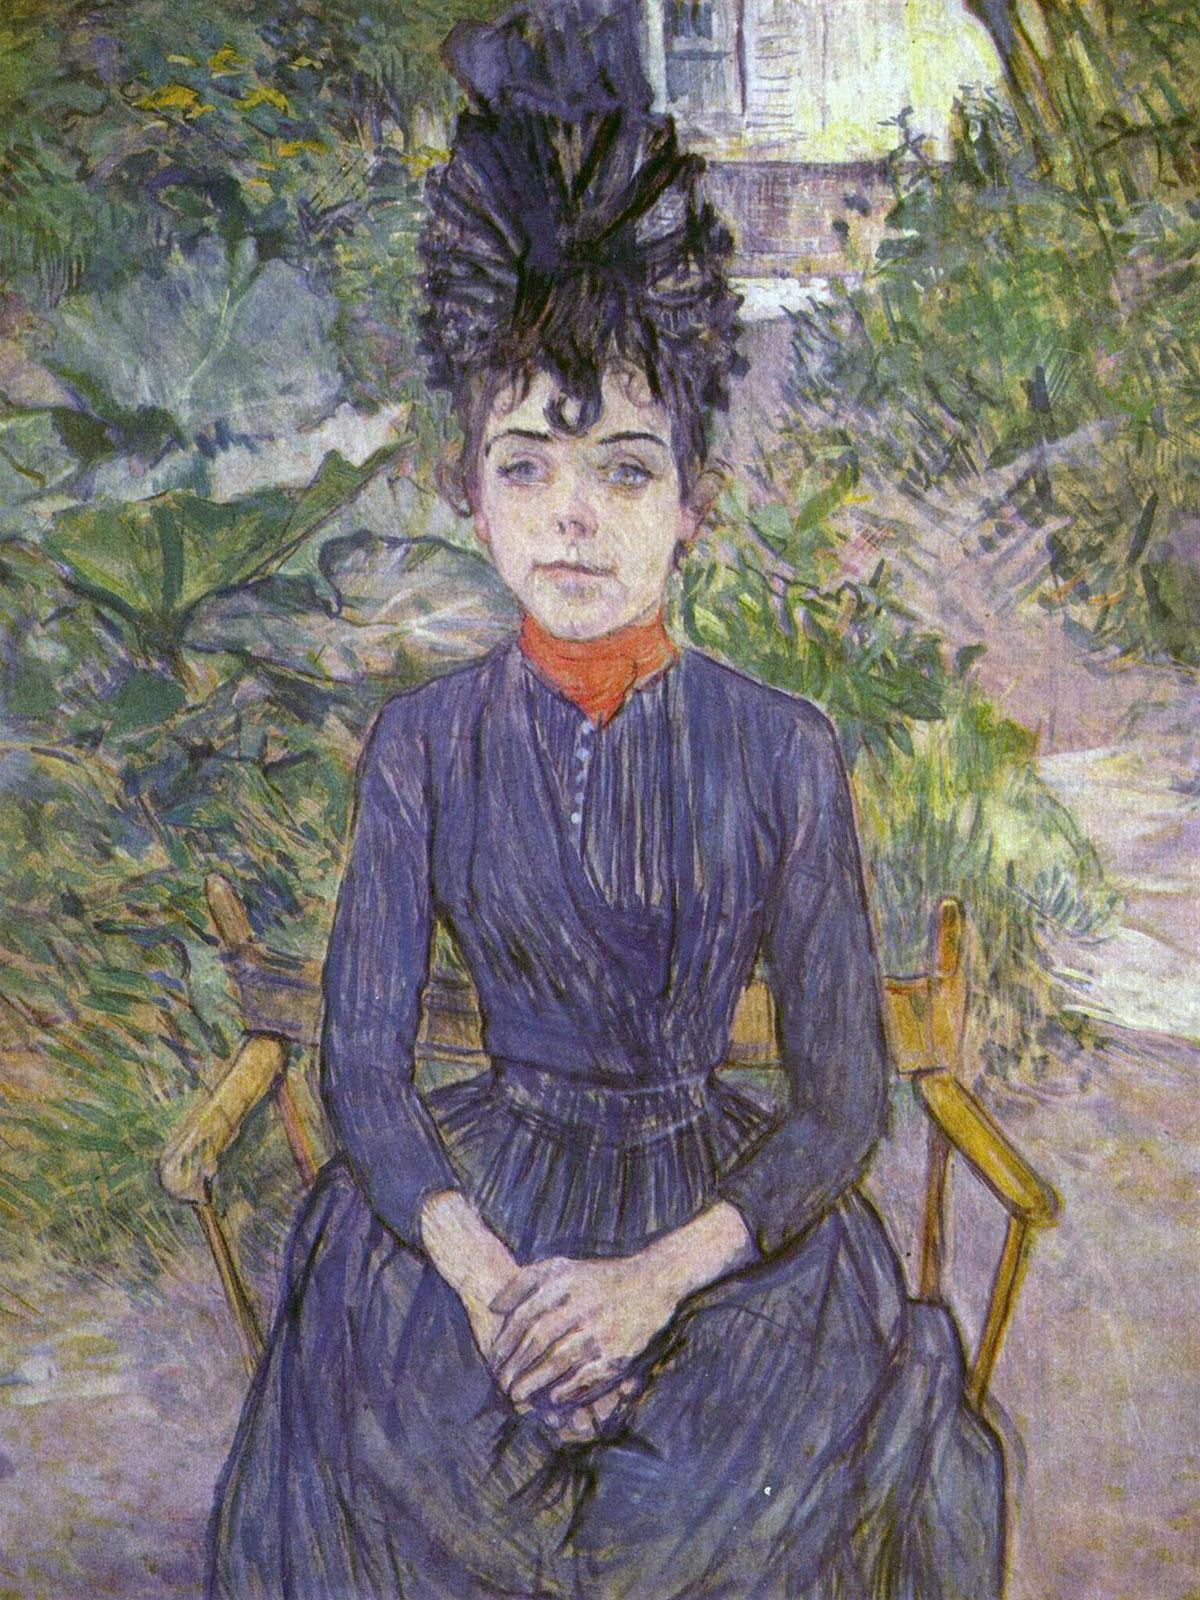 Justine Dieuhl seduta nel giardino di Forest, opera di Henri de Toulouse-Lautrec